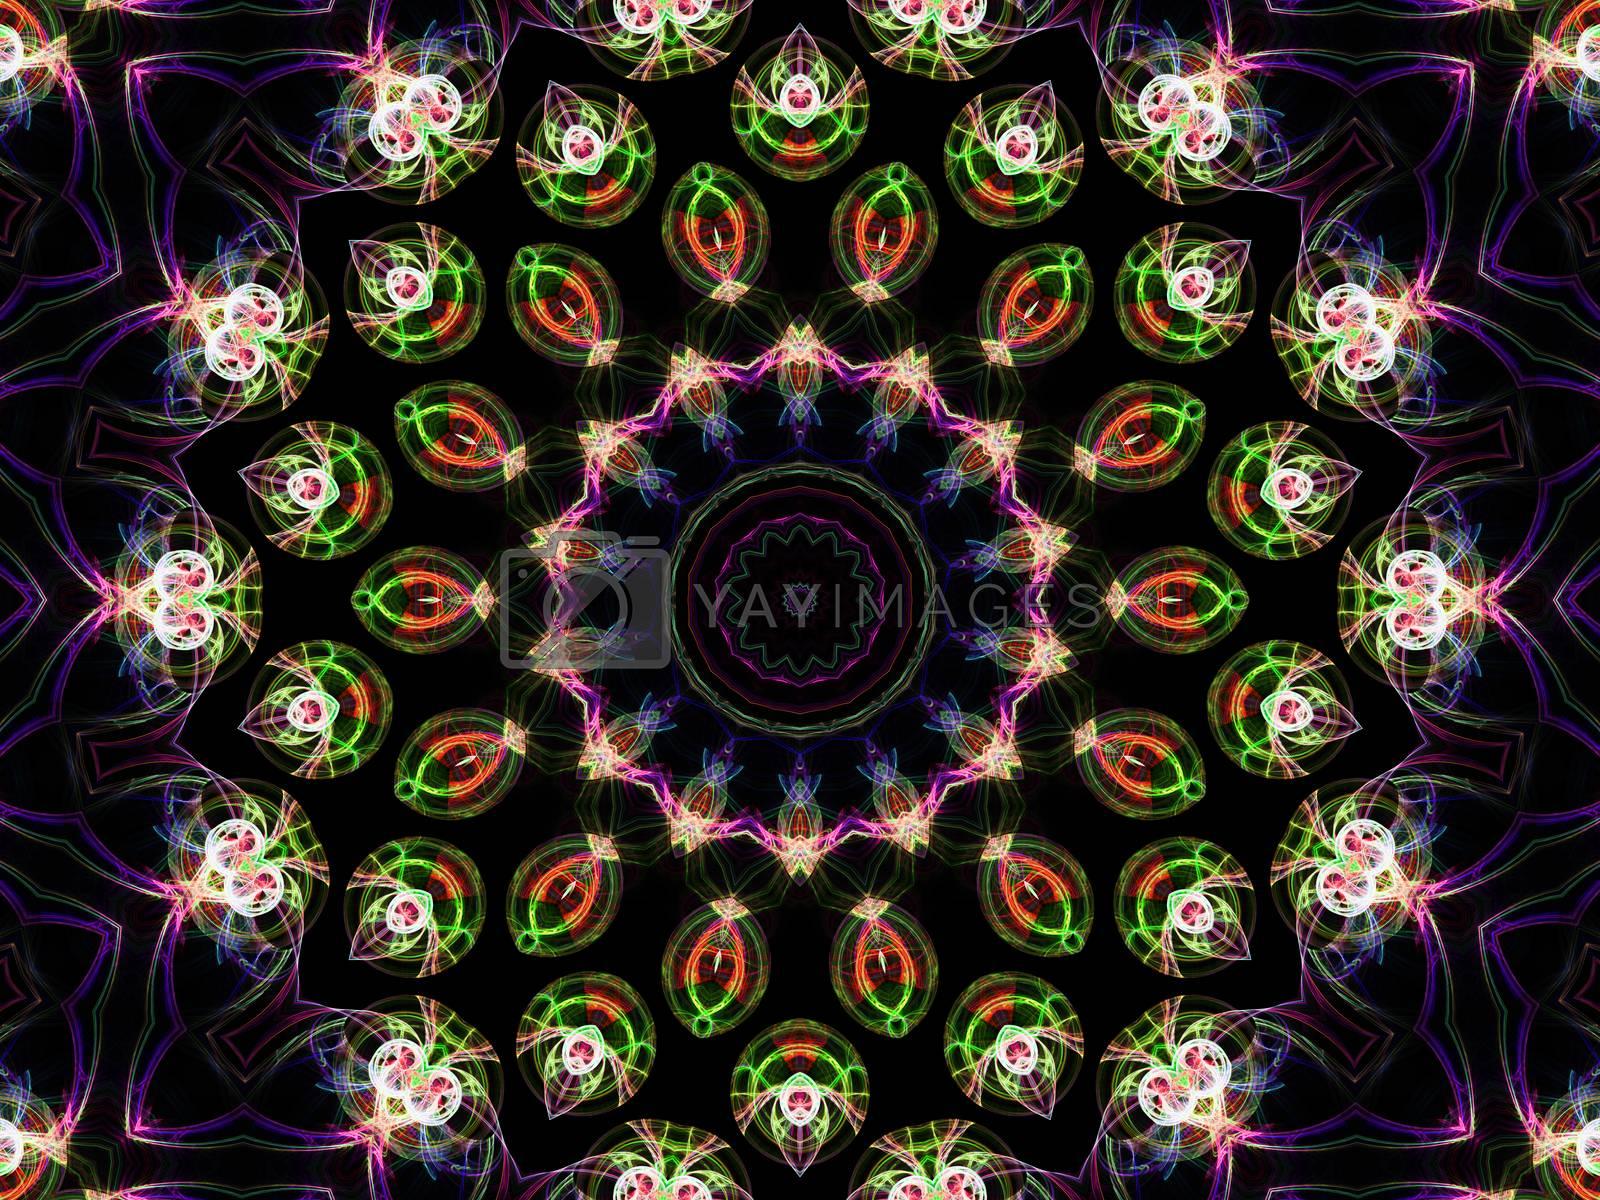 Colorful fractal kaleidoscope, digital artwork for creative graphic design by Sem007